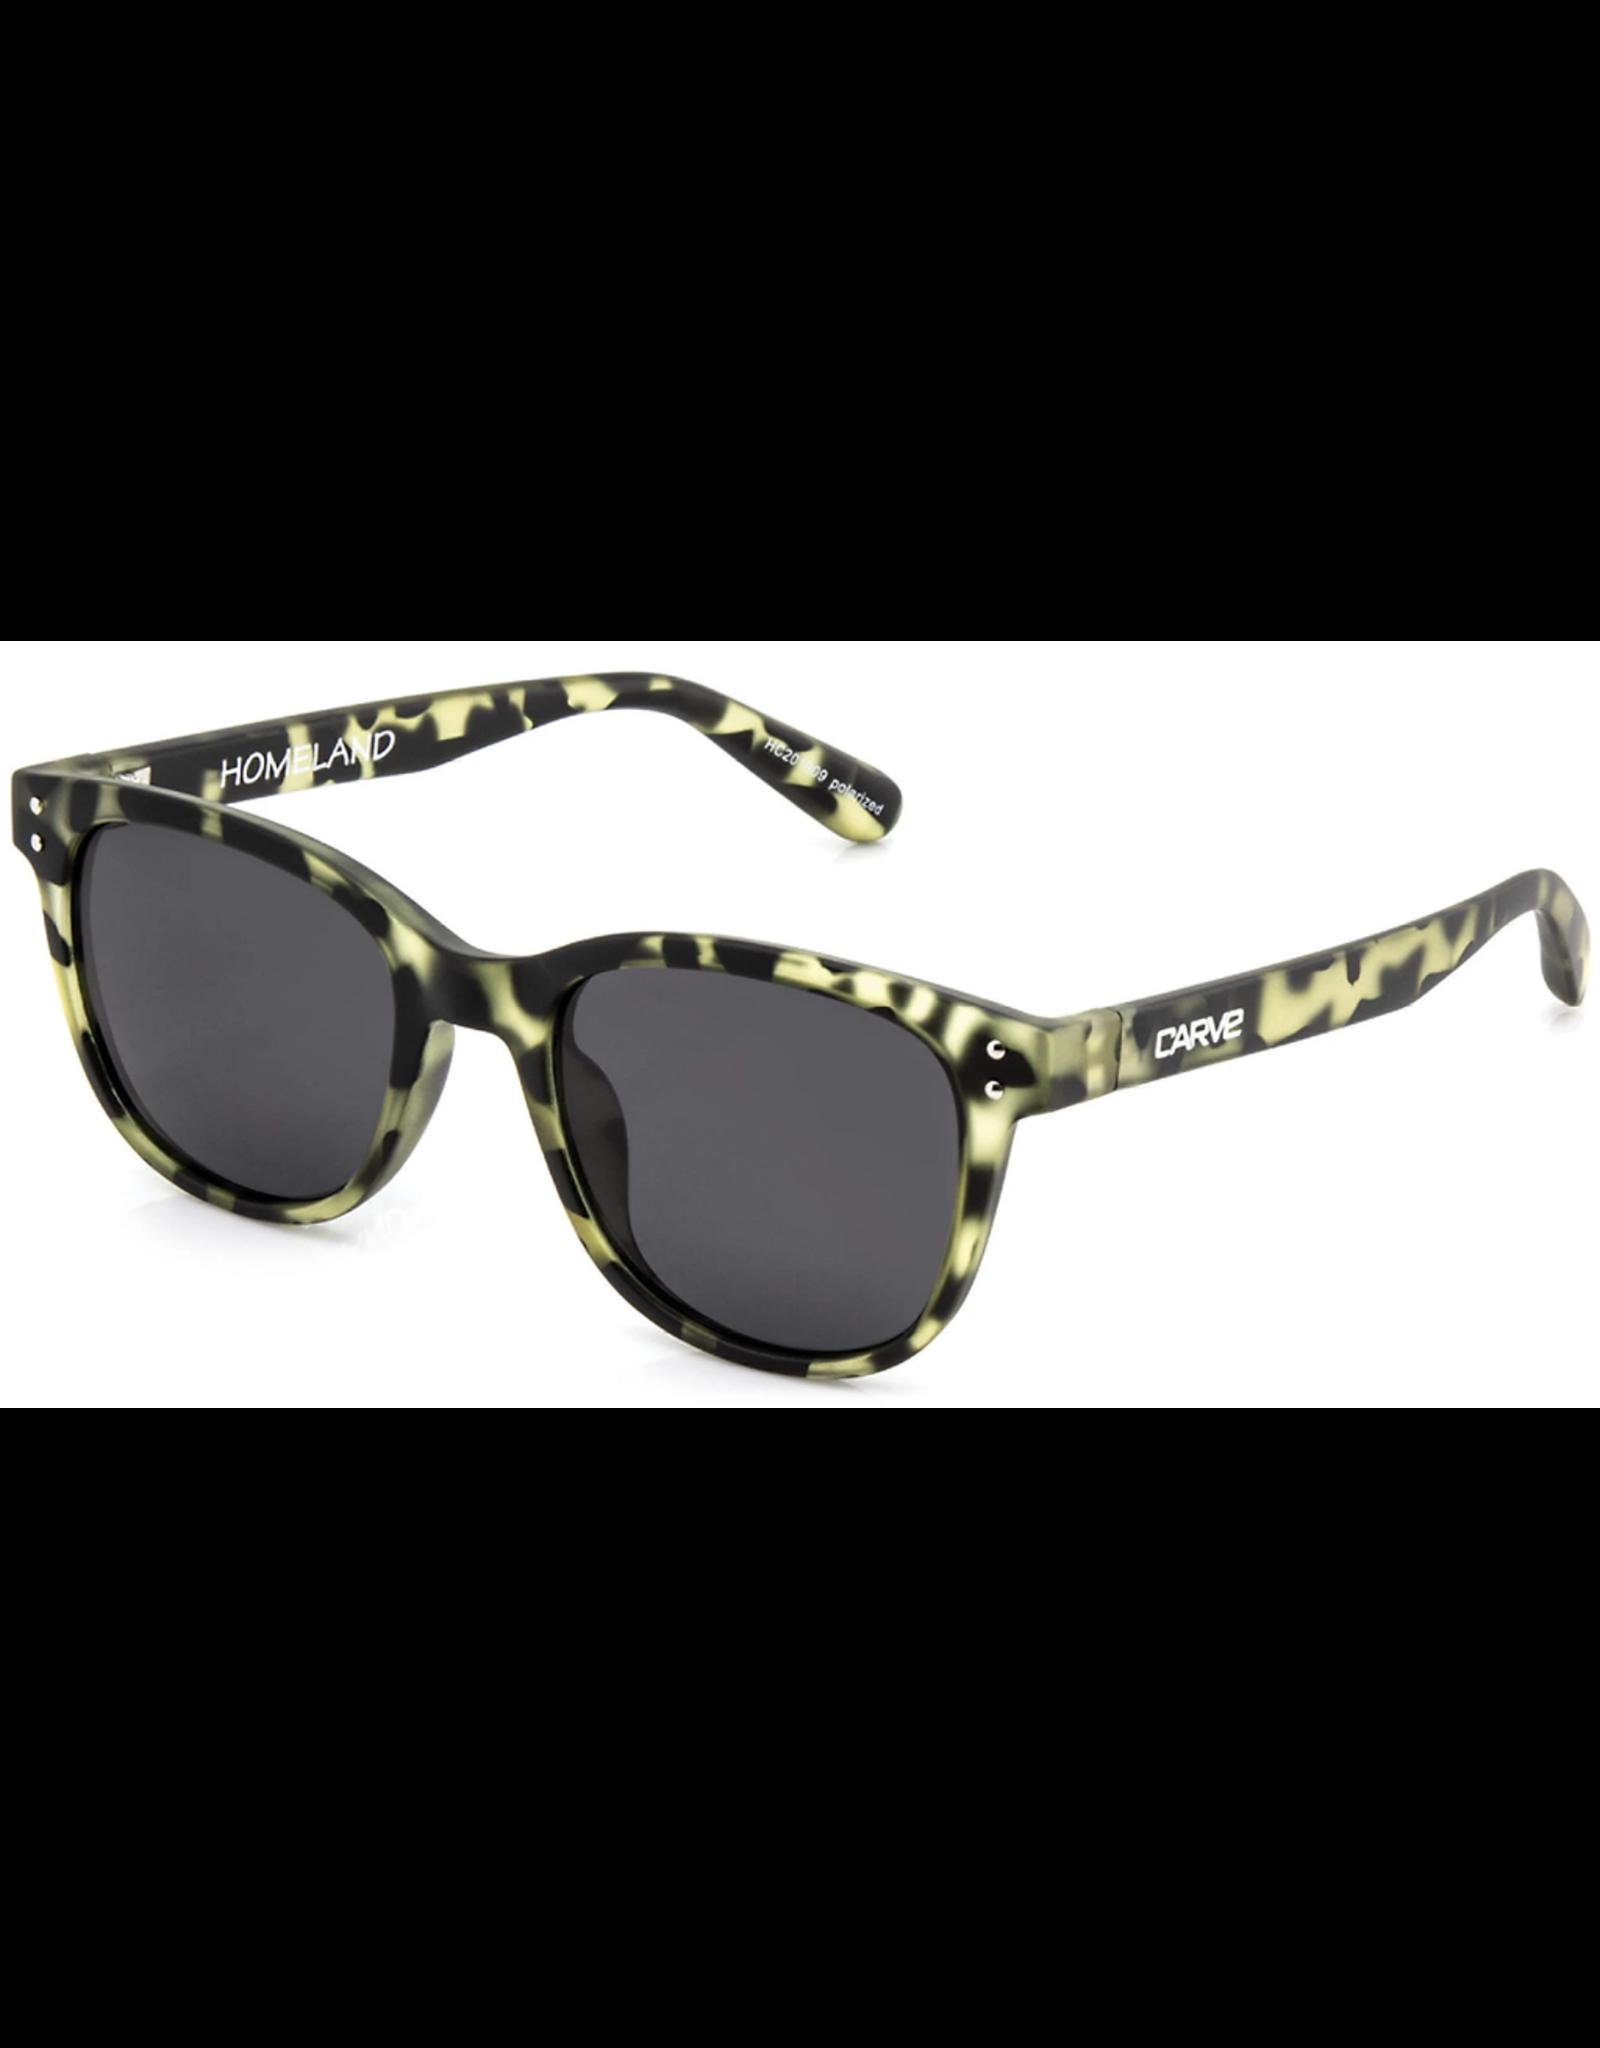 CARVE SUNGLASSES CARVE HOMELAND Polarized Sunglasses